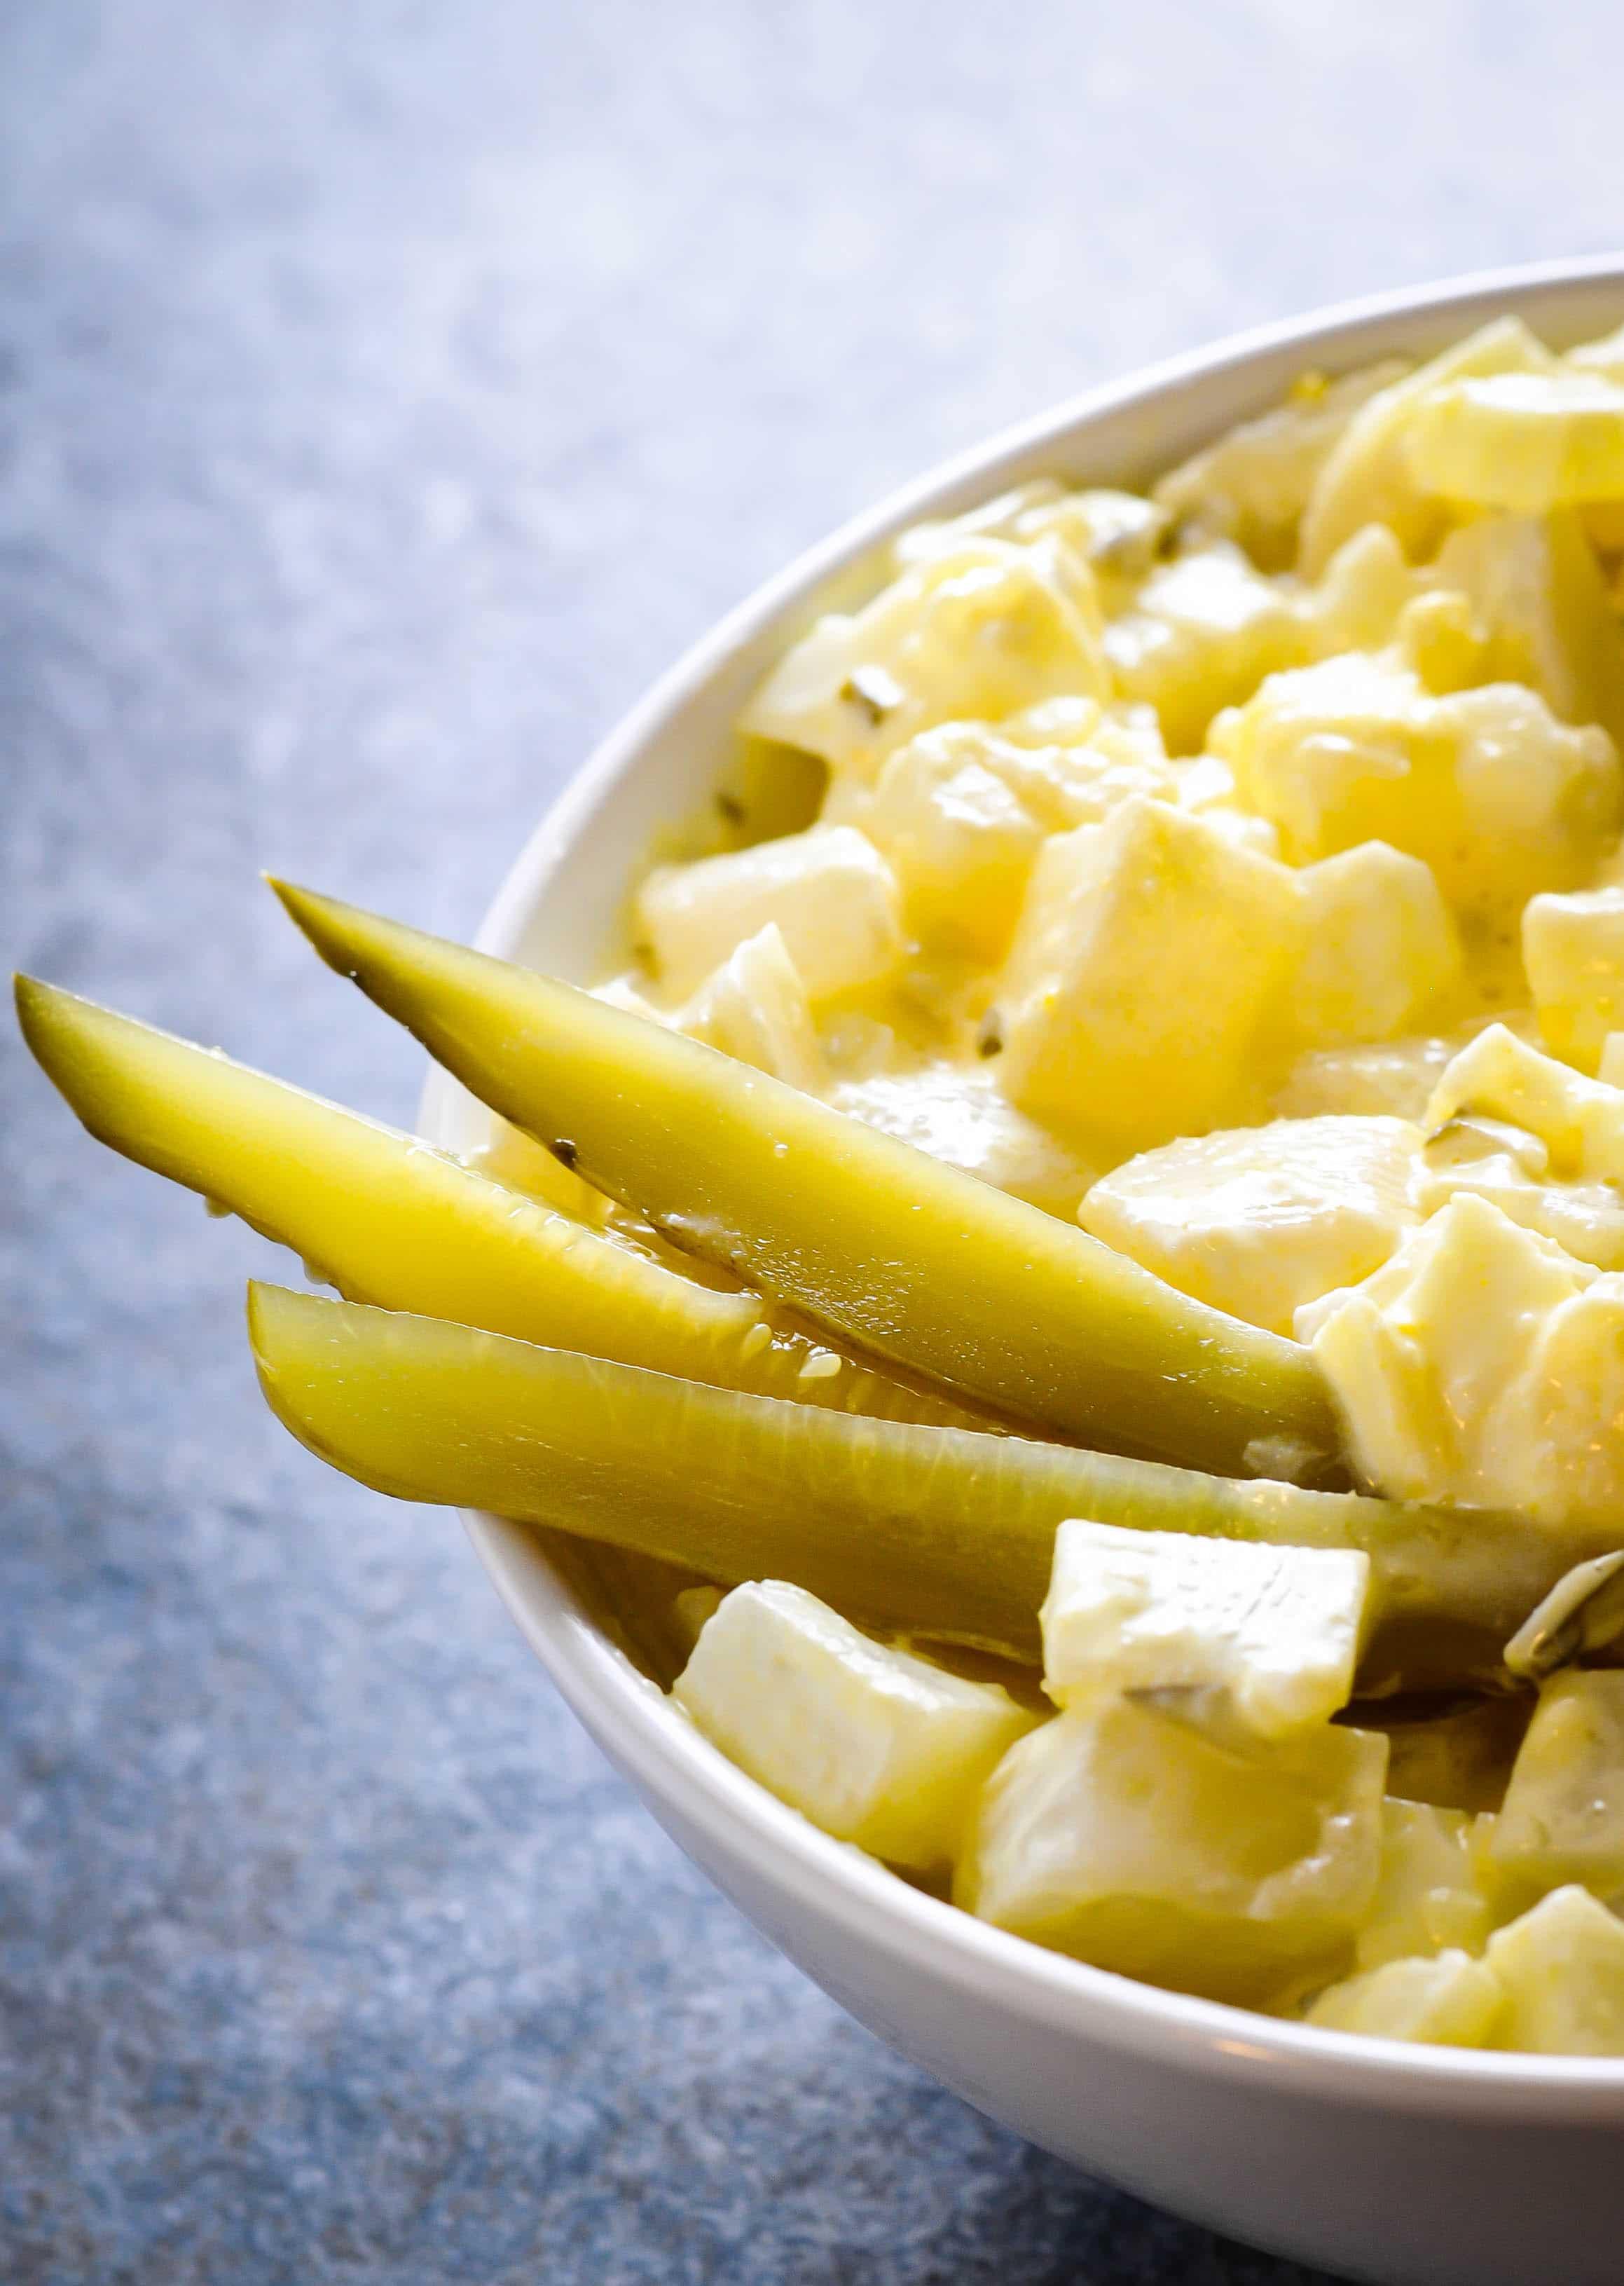 Low Carb Potato Salad Recipe - Turnip instead of potato